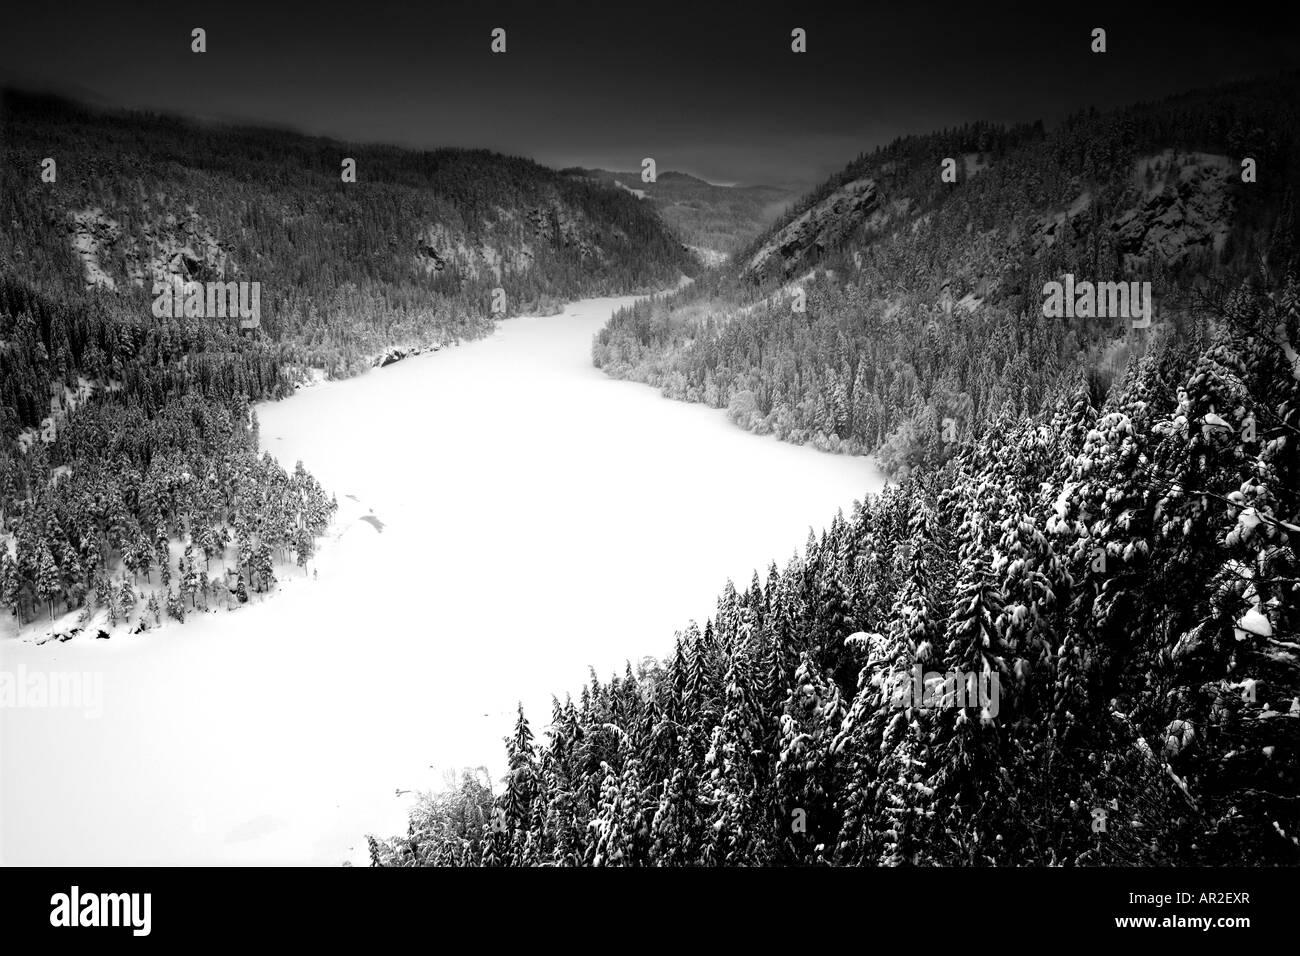 Snowy winter landscape with dark skies, in Aurdal valley, Valdres, Norway. - Stock Image